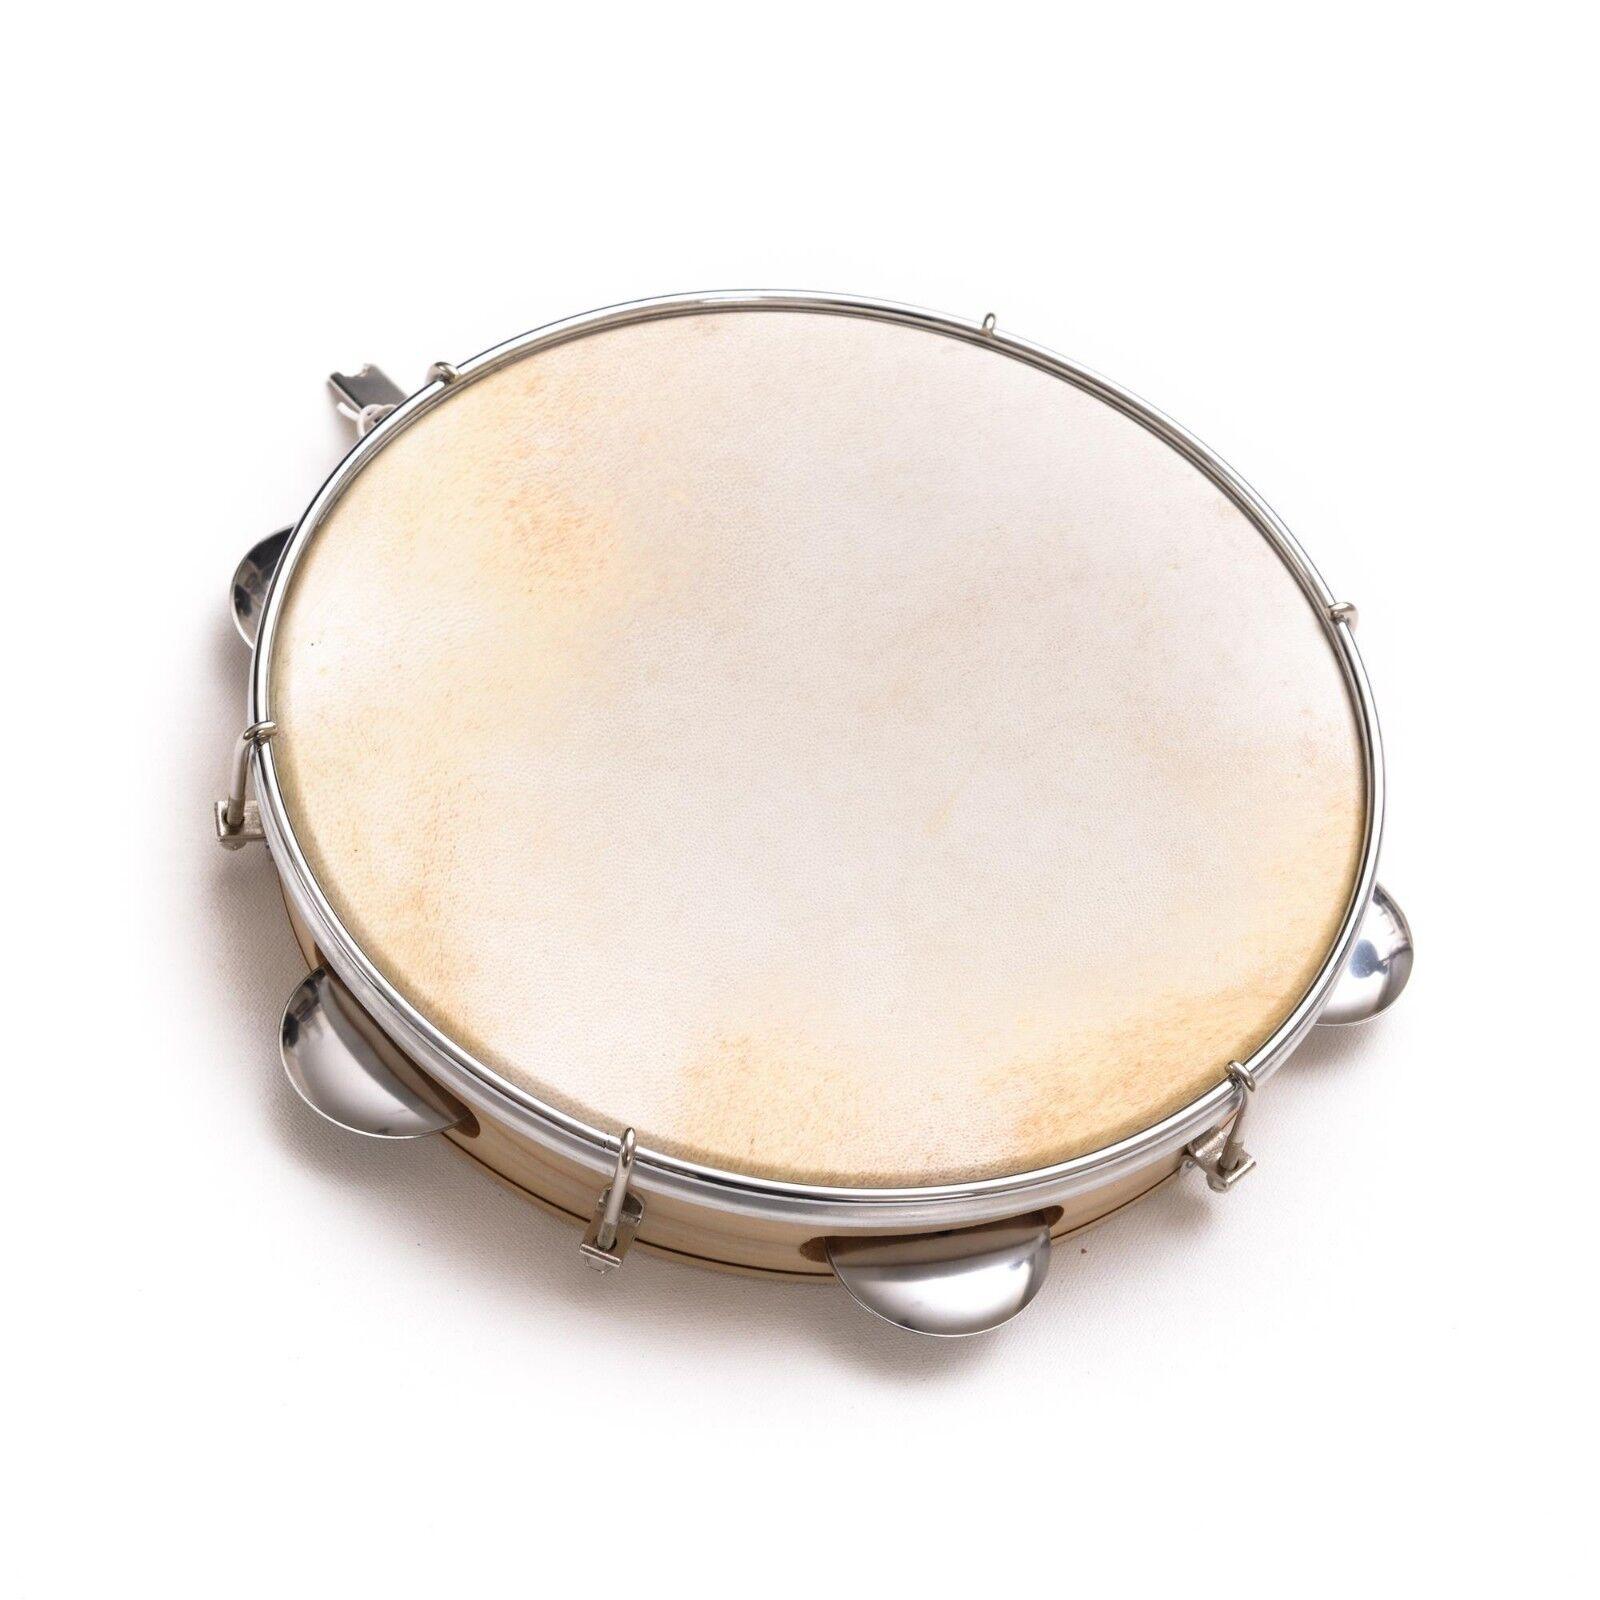 Capoeira pelle Pandeiro Tamburo Tamburello Samba Brasile Musica Strumento